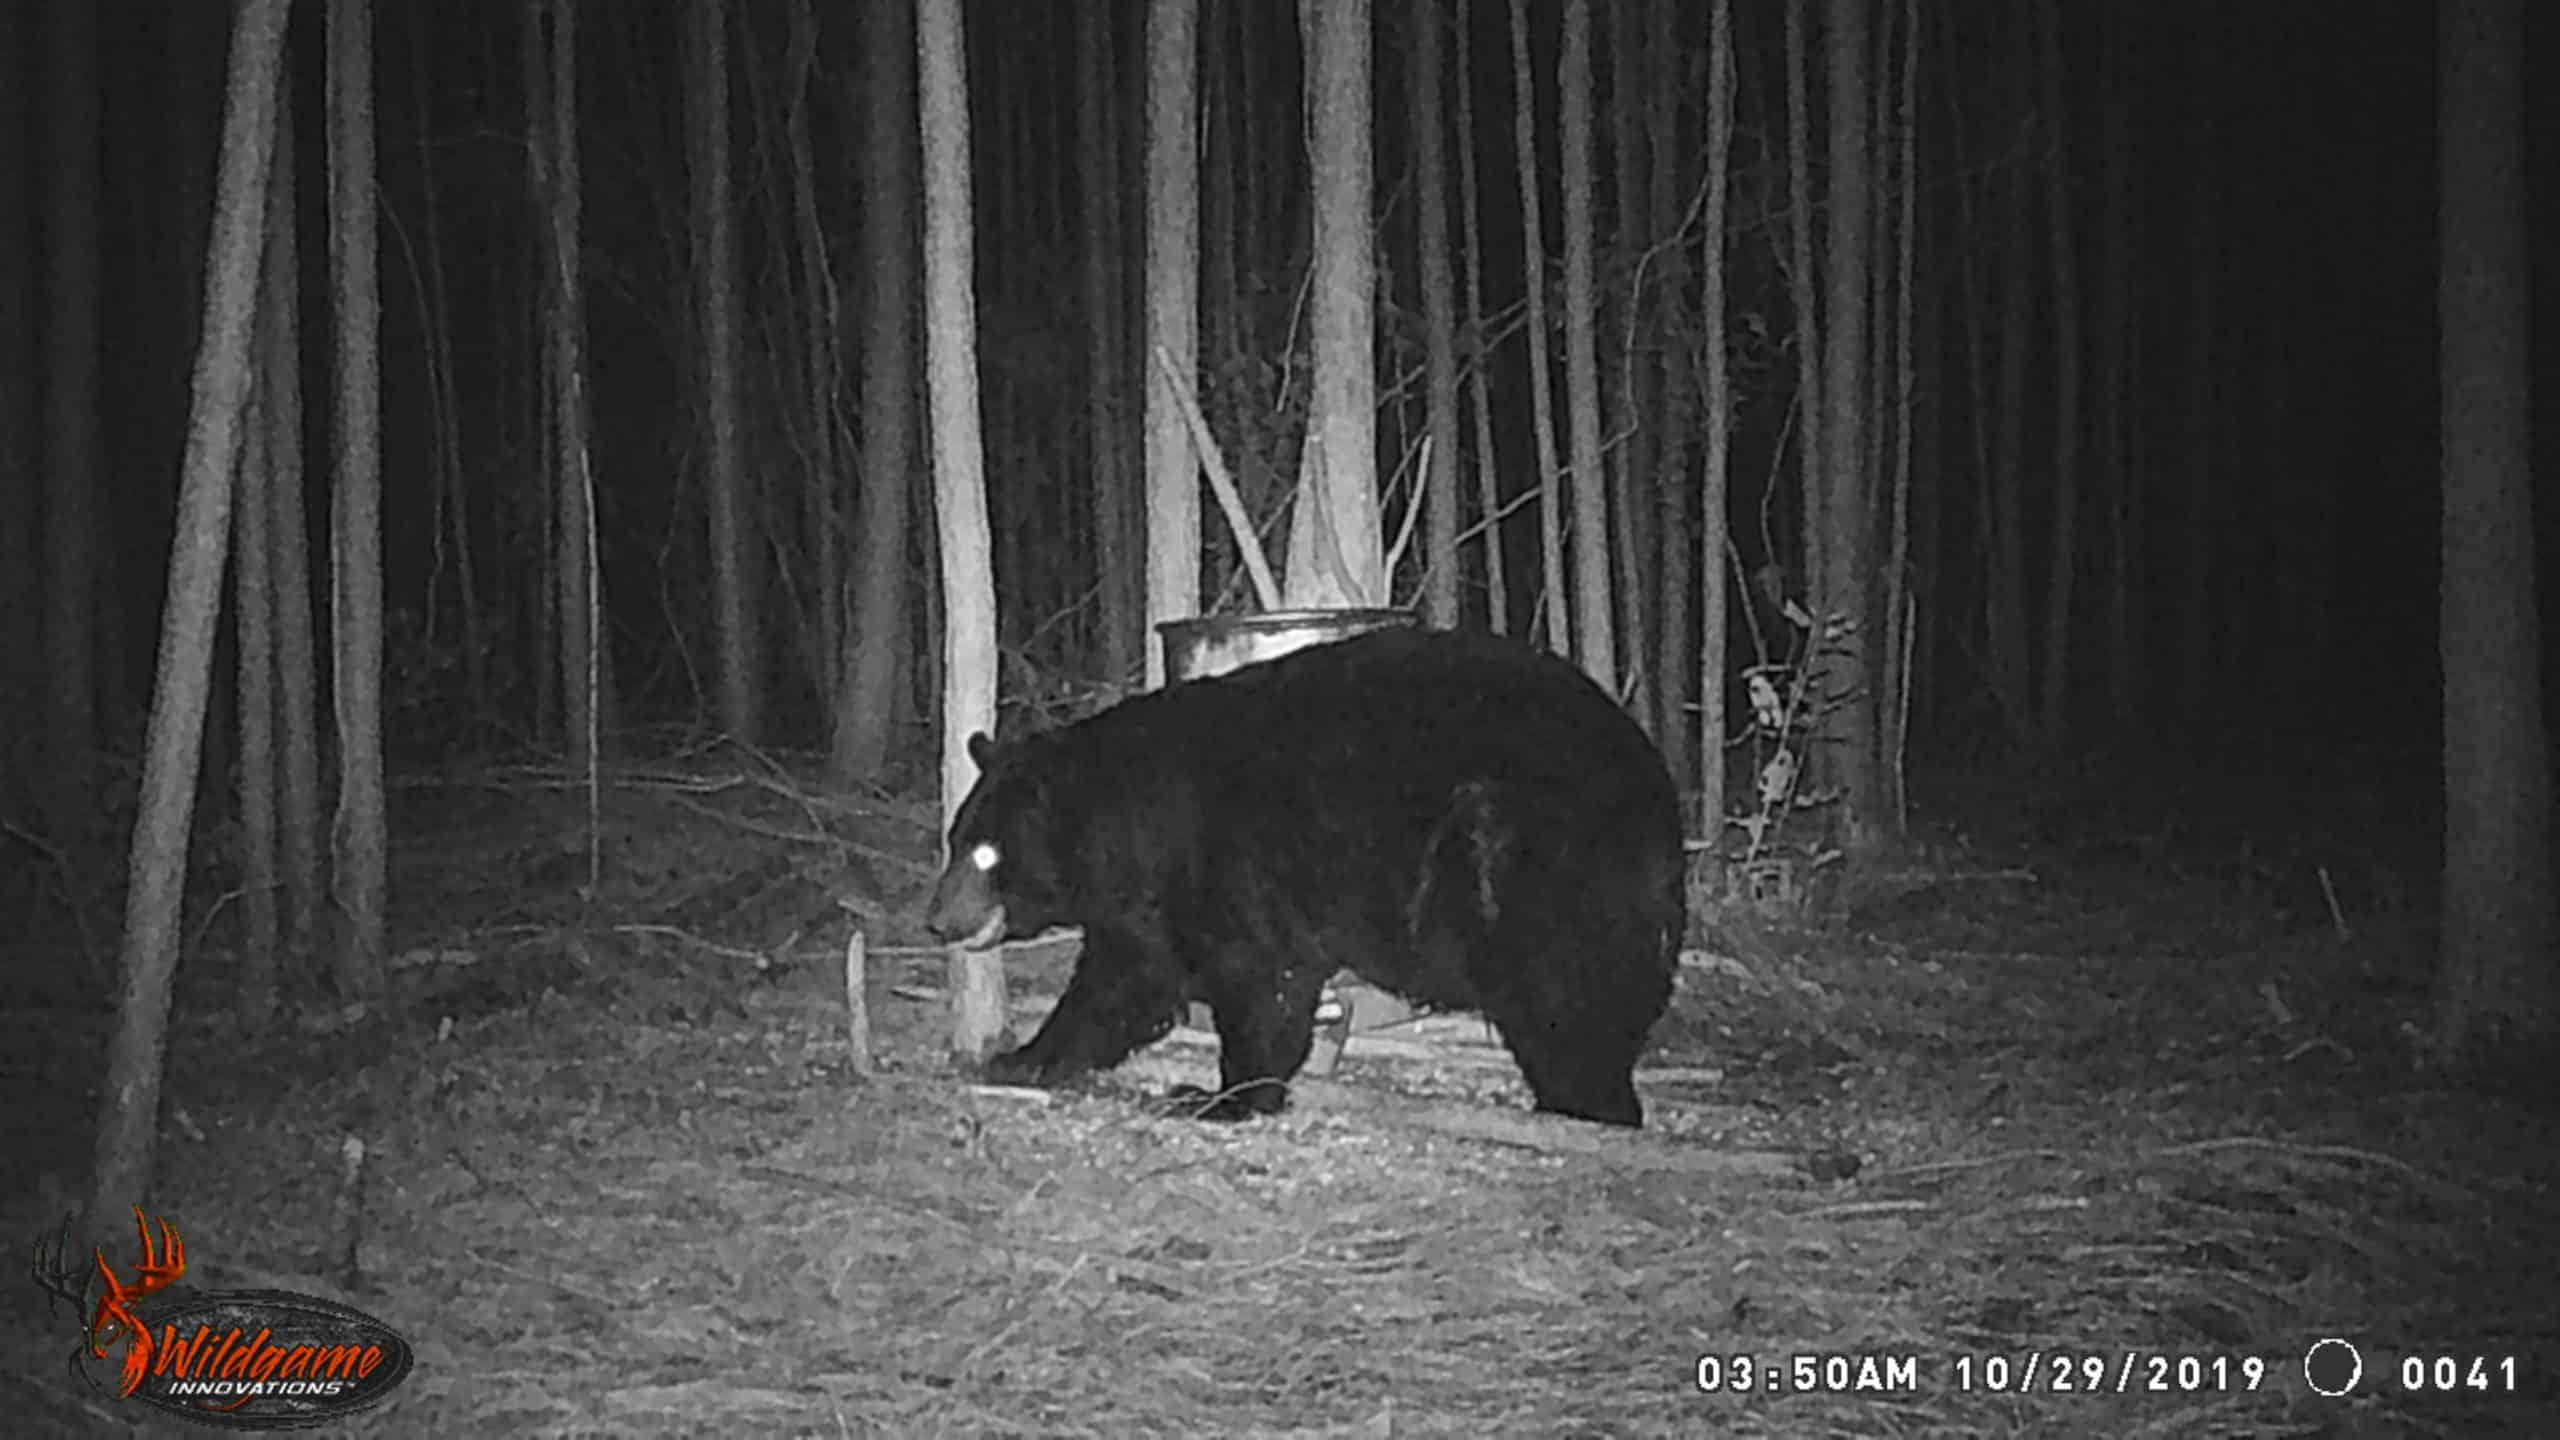 Large male bear